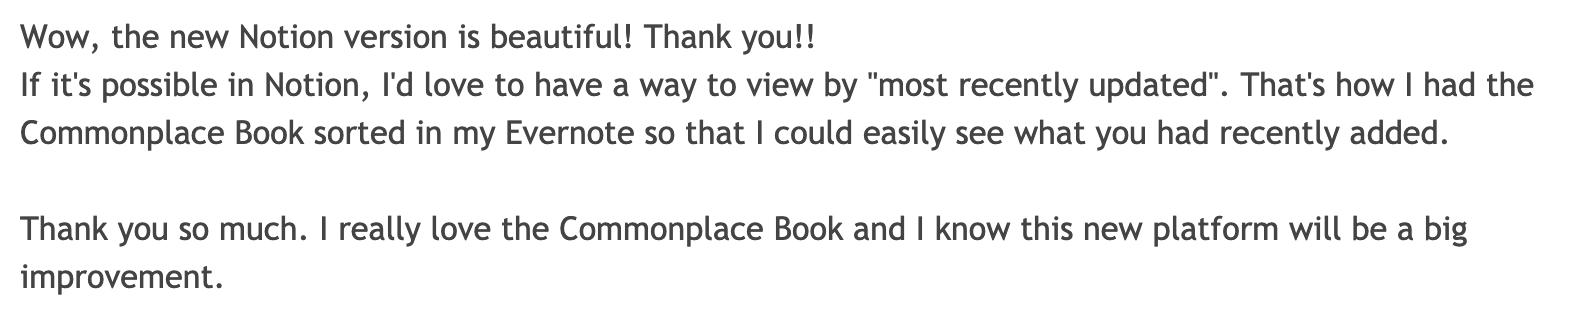 Commonplace Book Praise